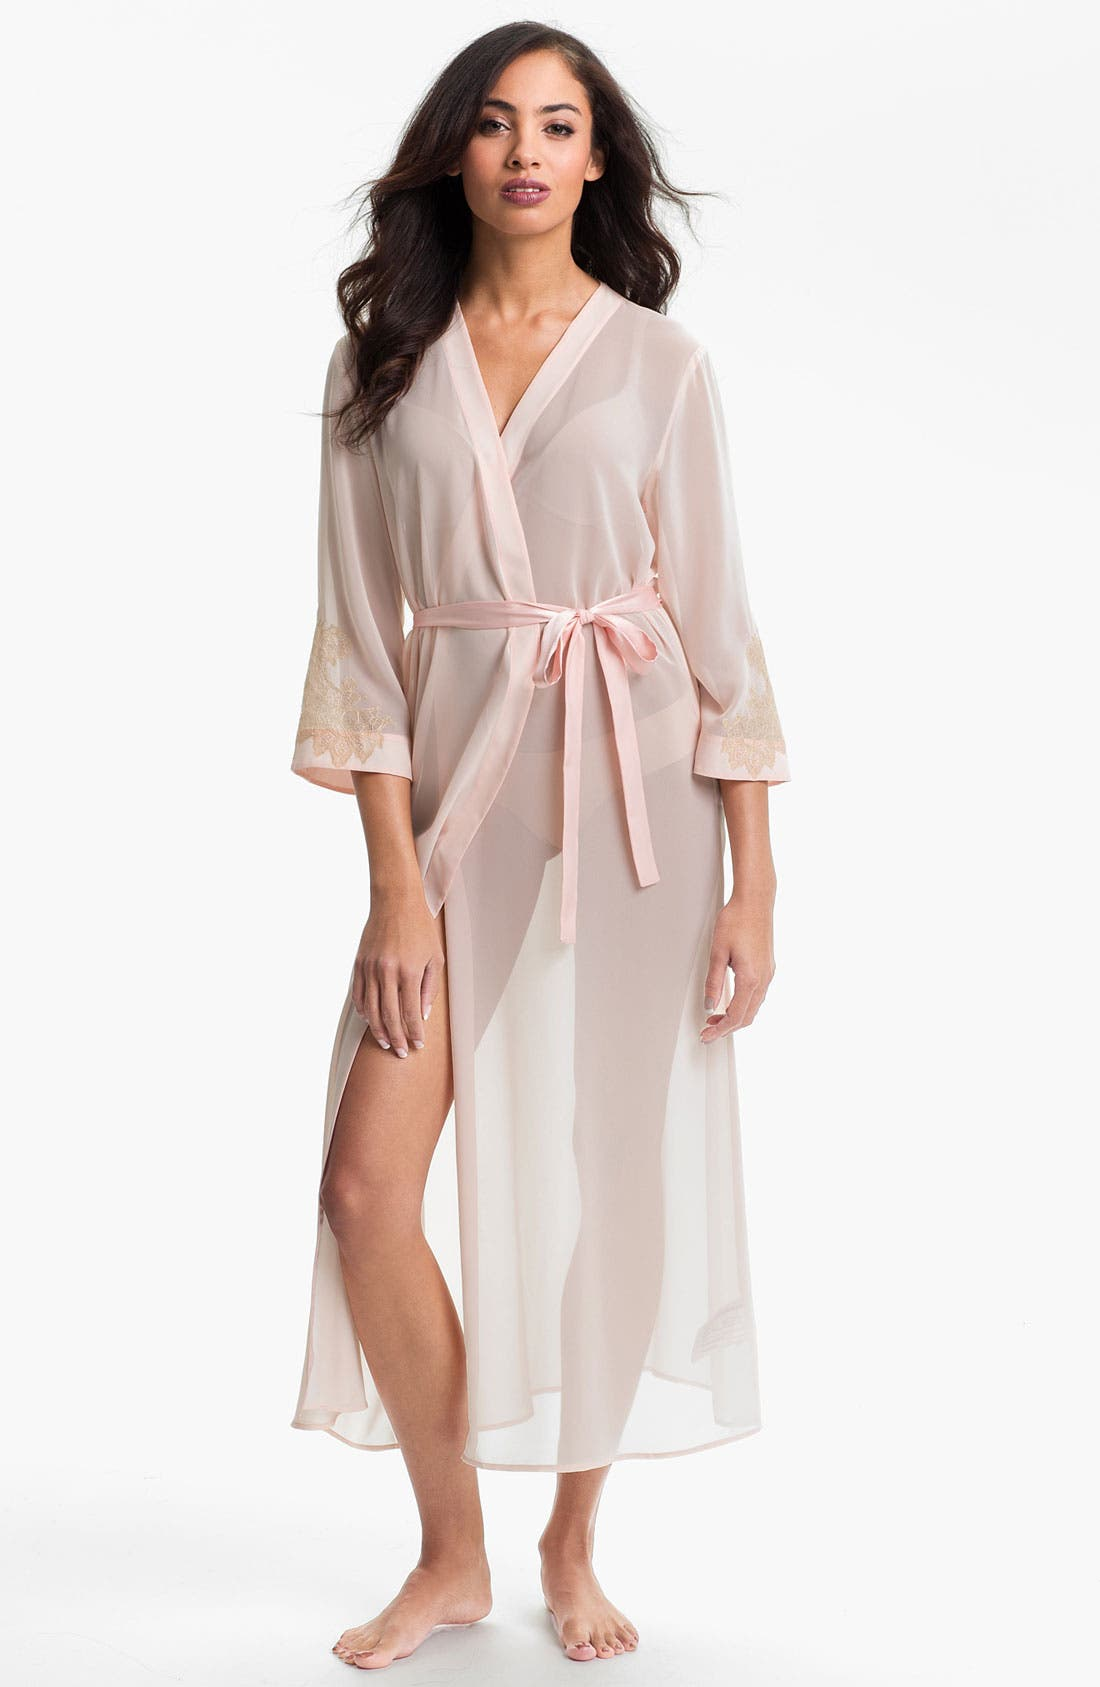 Main Image - Oscar de la Renta Sleepwear 'Lace Trellis' Chiffon Robe